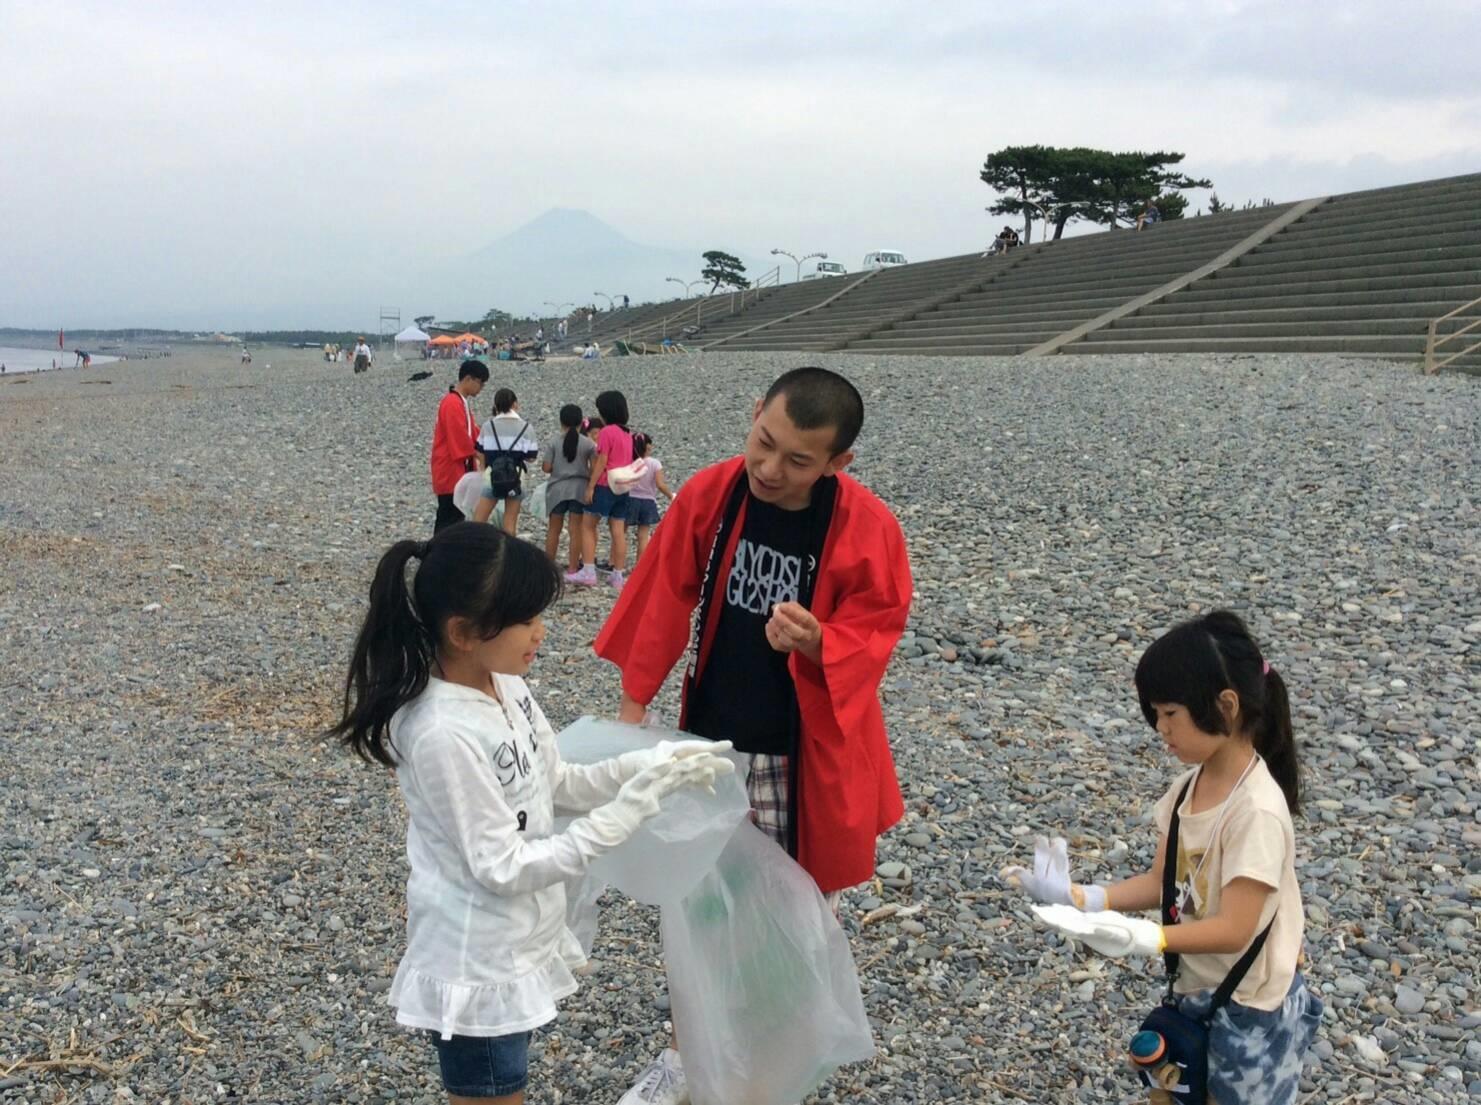 http://47web.jp/shizuoka/uploads/11060.jpg